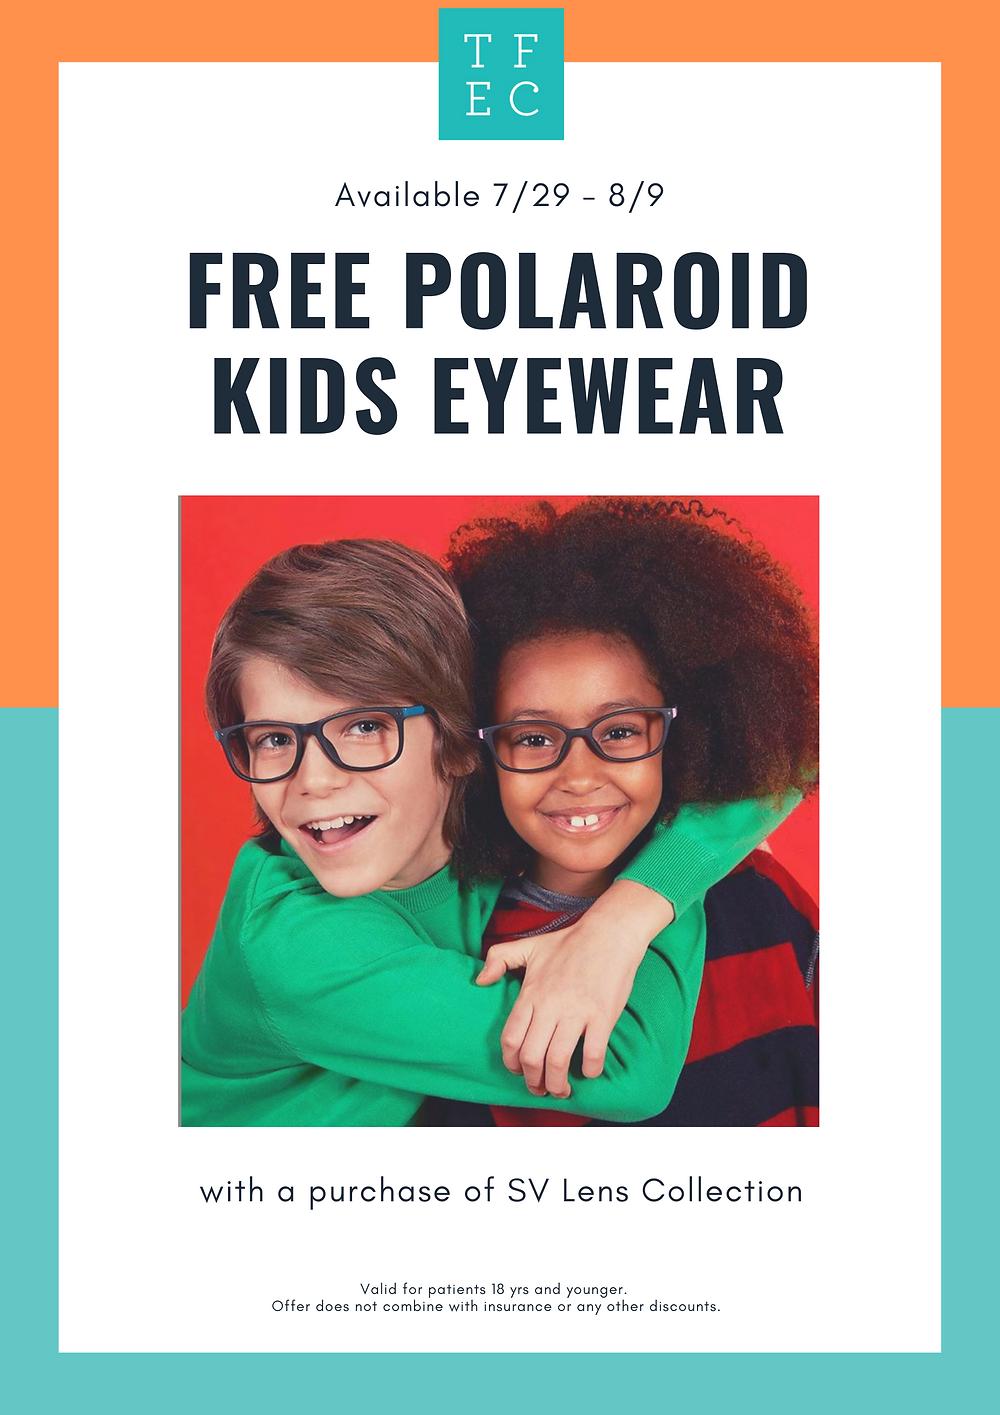 Tallmadge family eye care dawson polaroid eyewear glasses